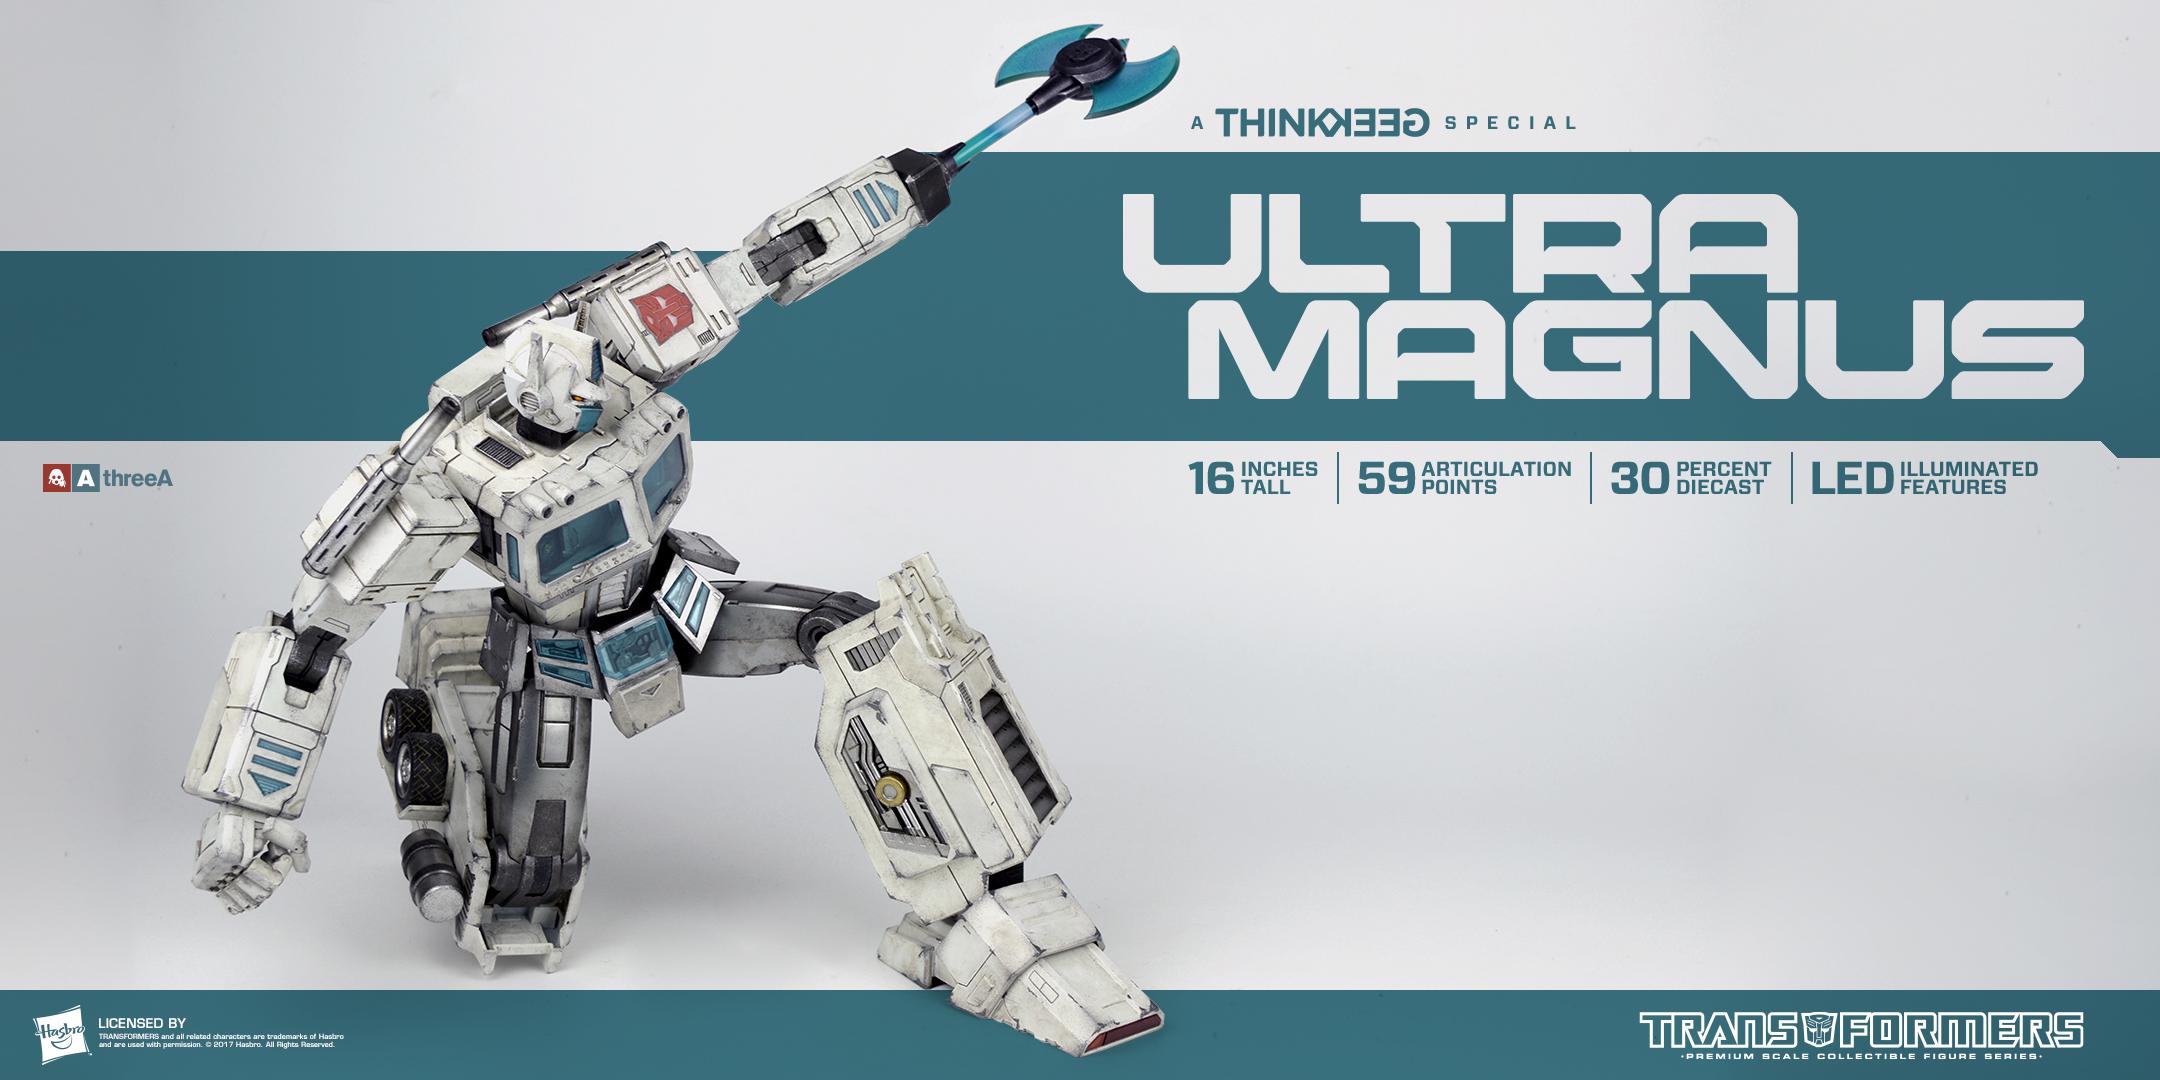 3A_Transformers_G1_UltraMagnus_2160x1080_v004a.png